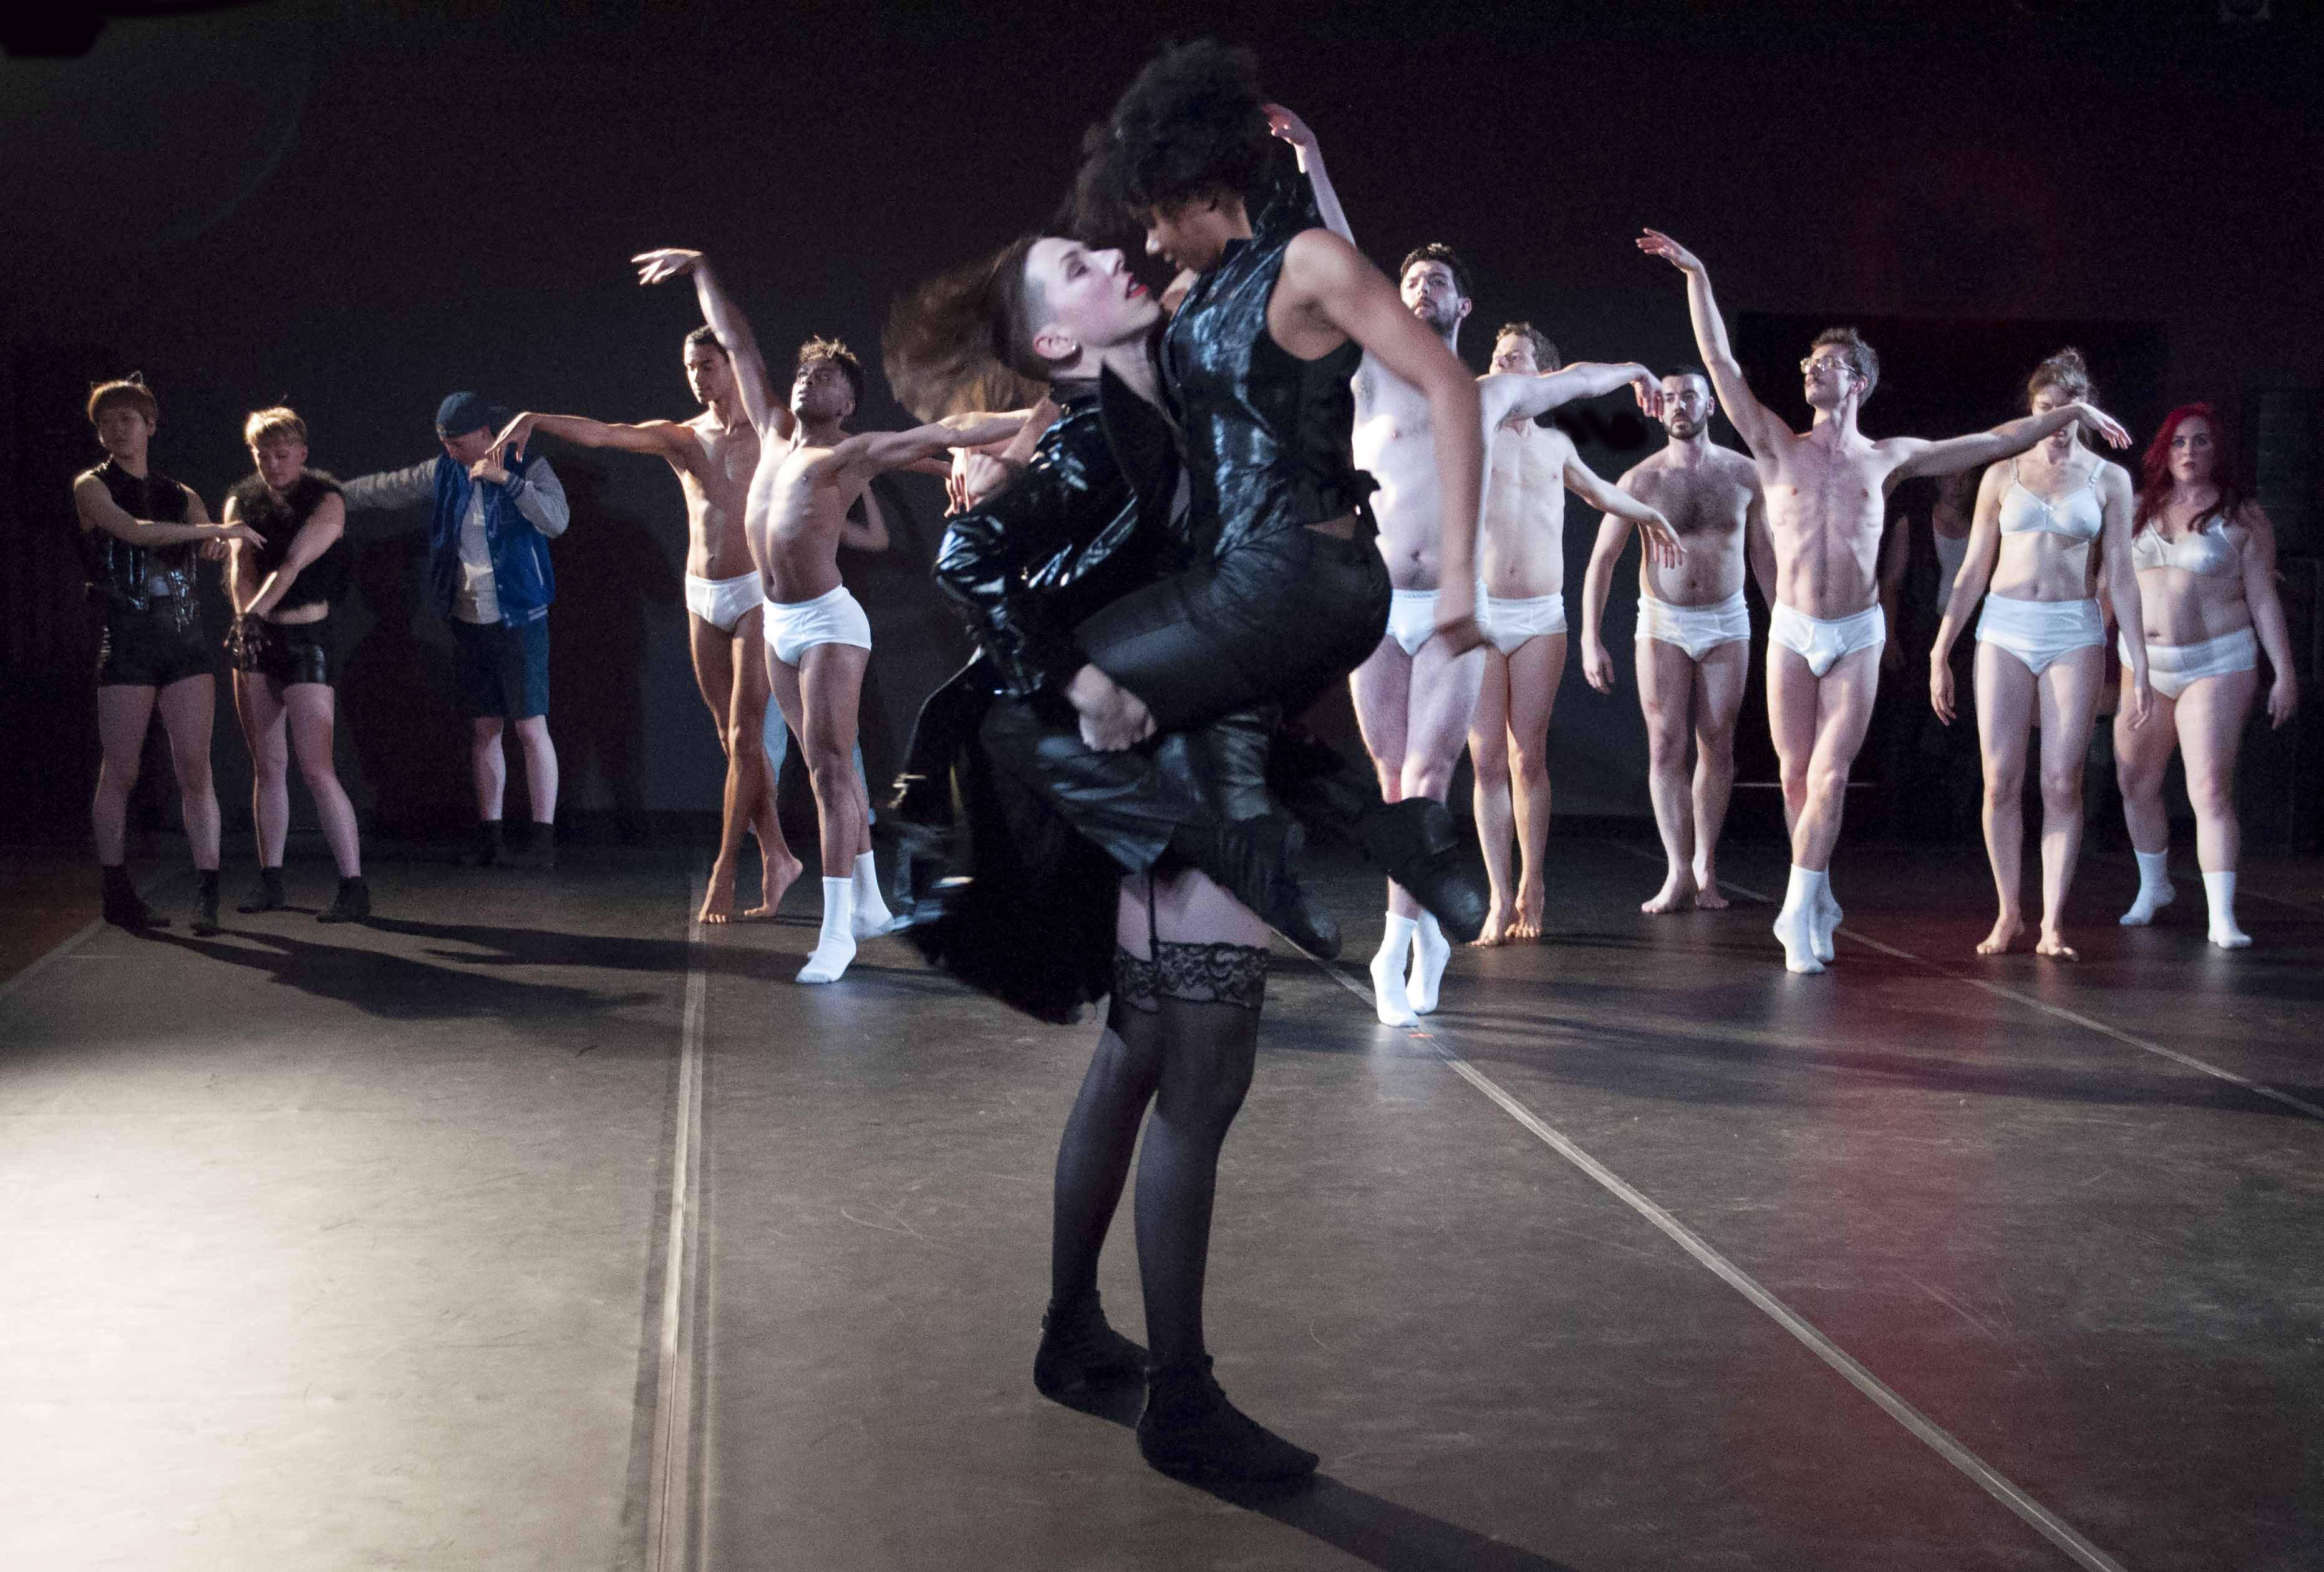 Dancer lesbian video